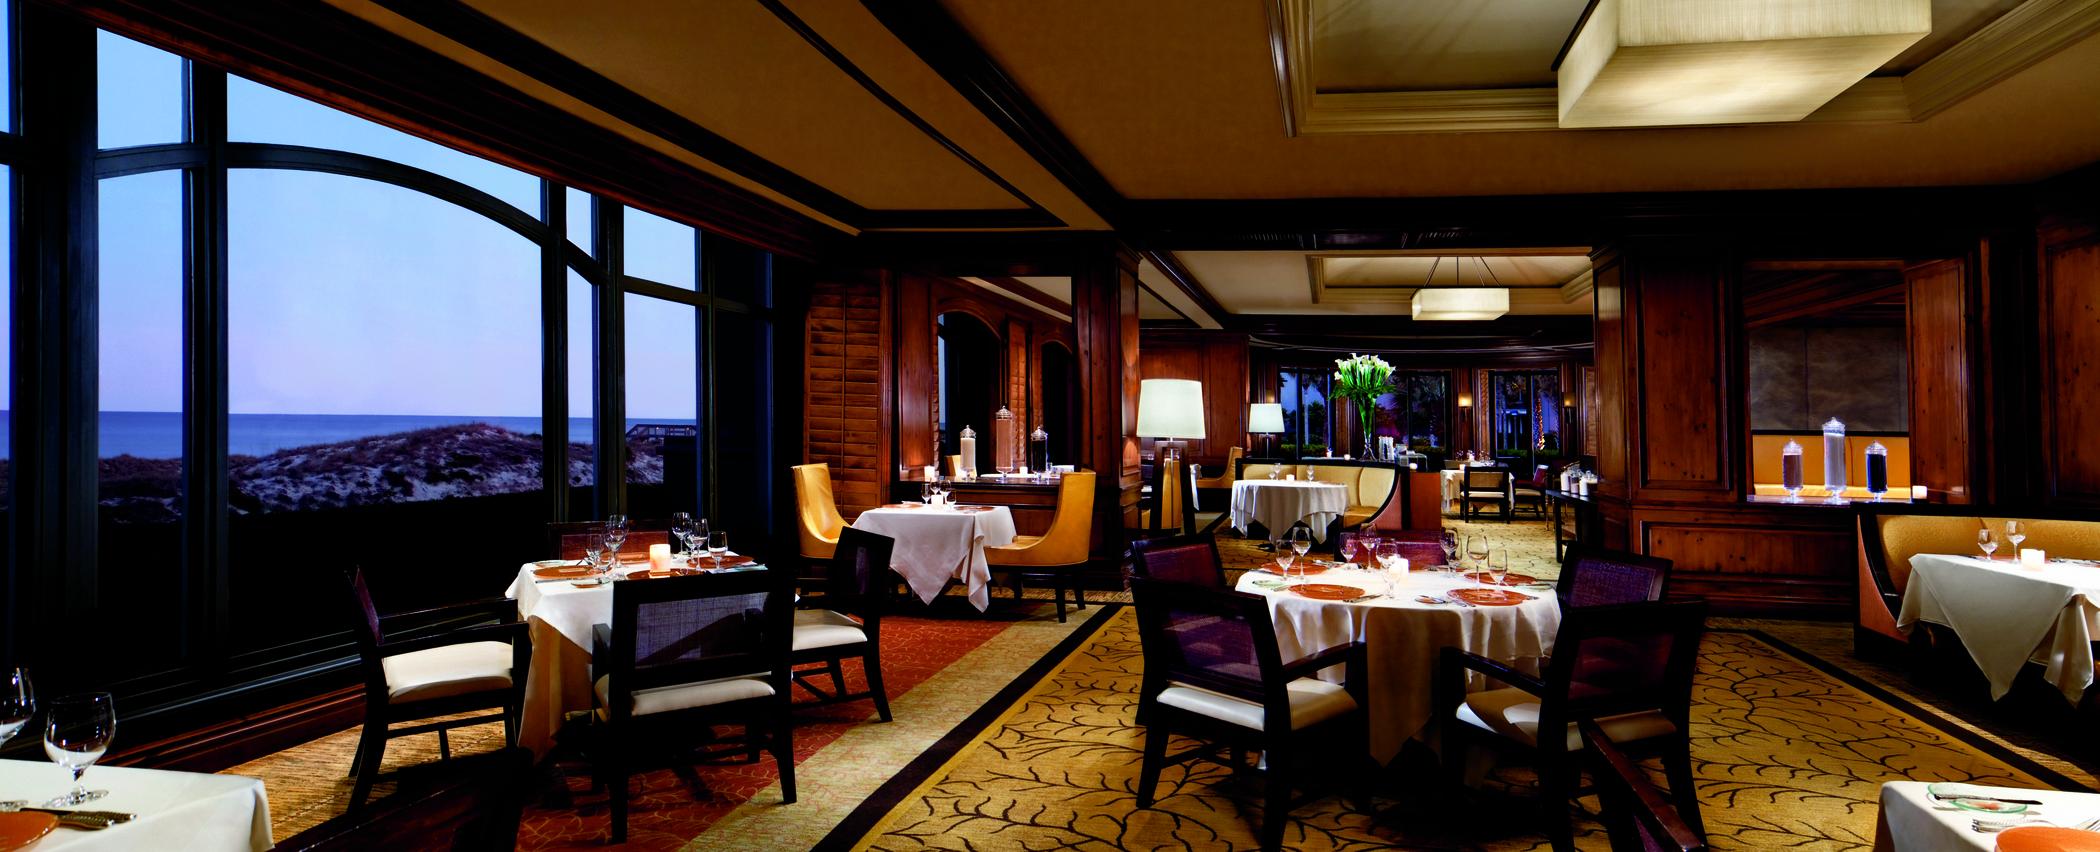 Salt_in-The-Ritz-Carlton-Amelia-Island.jpg